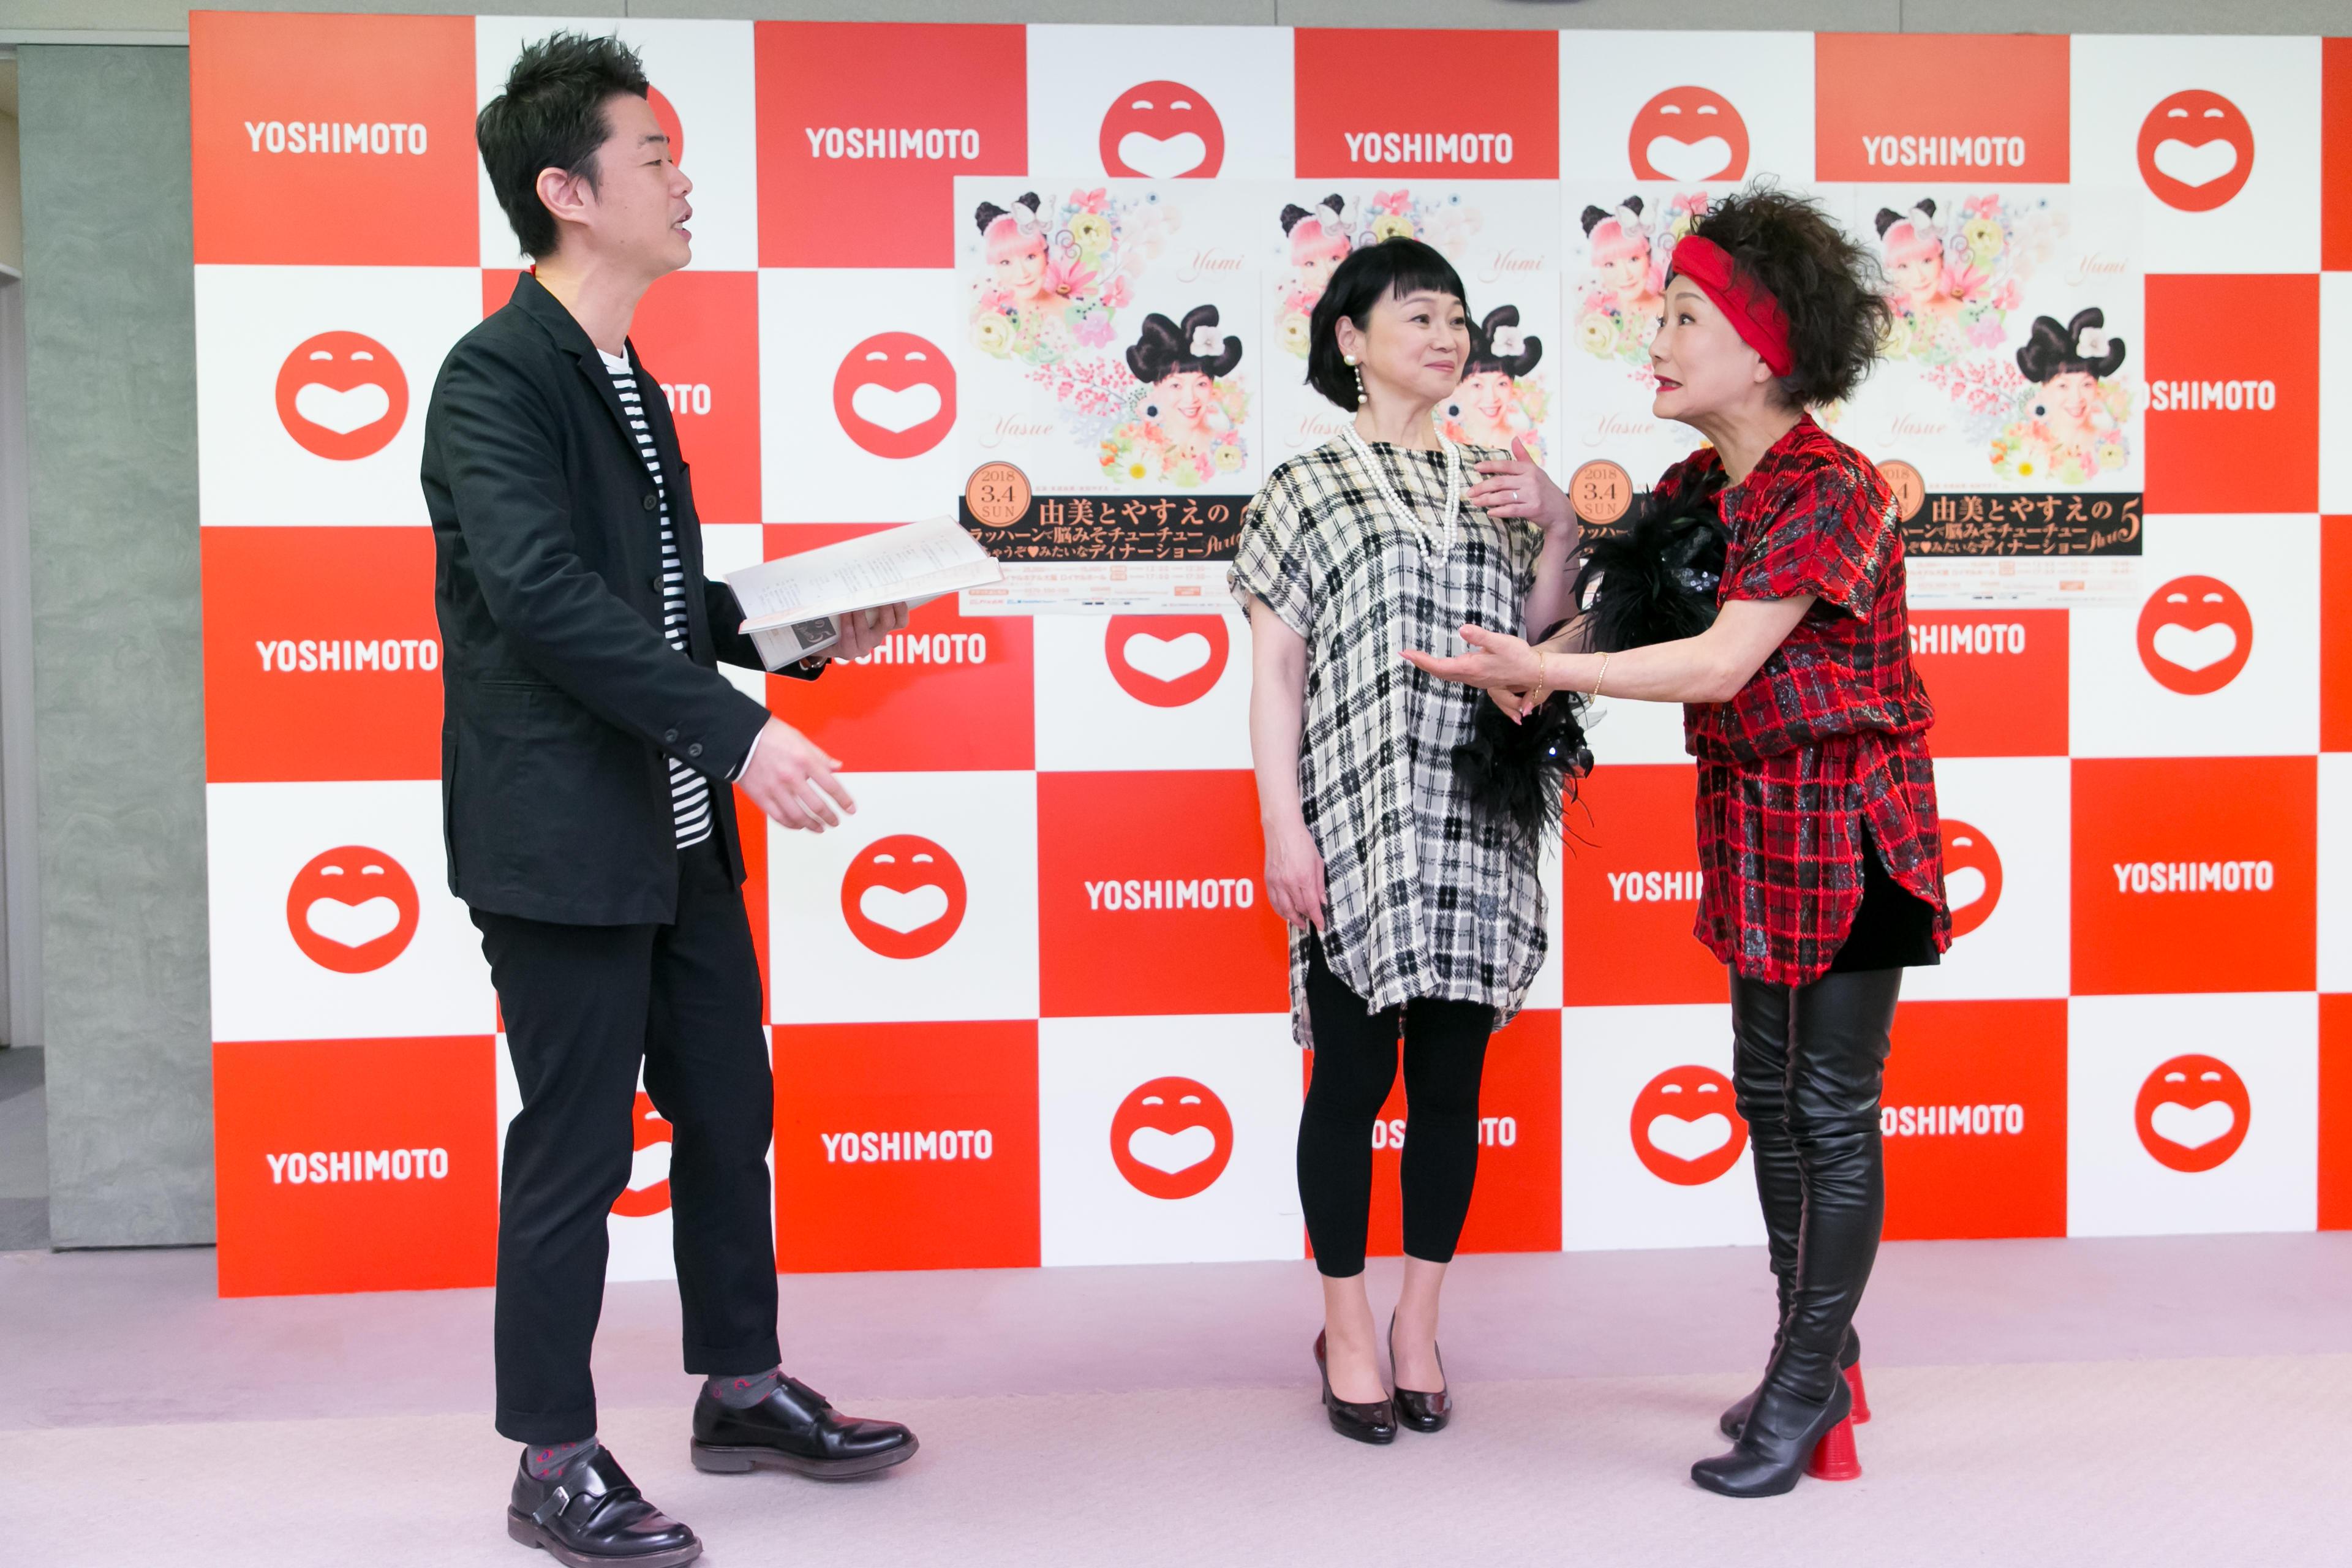 http://news.yoshimoto.co.jp/20171219143936-ed0609a09173640a38b80a042ad61cb96563149a.jpg